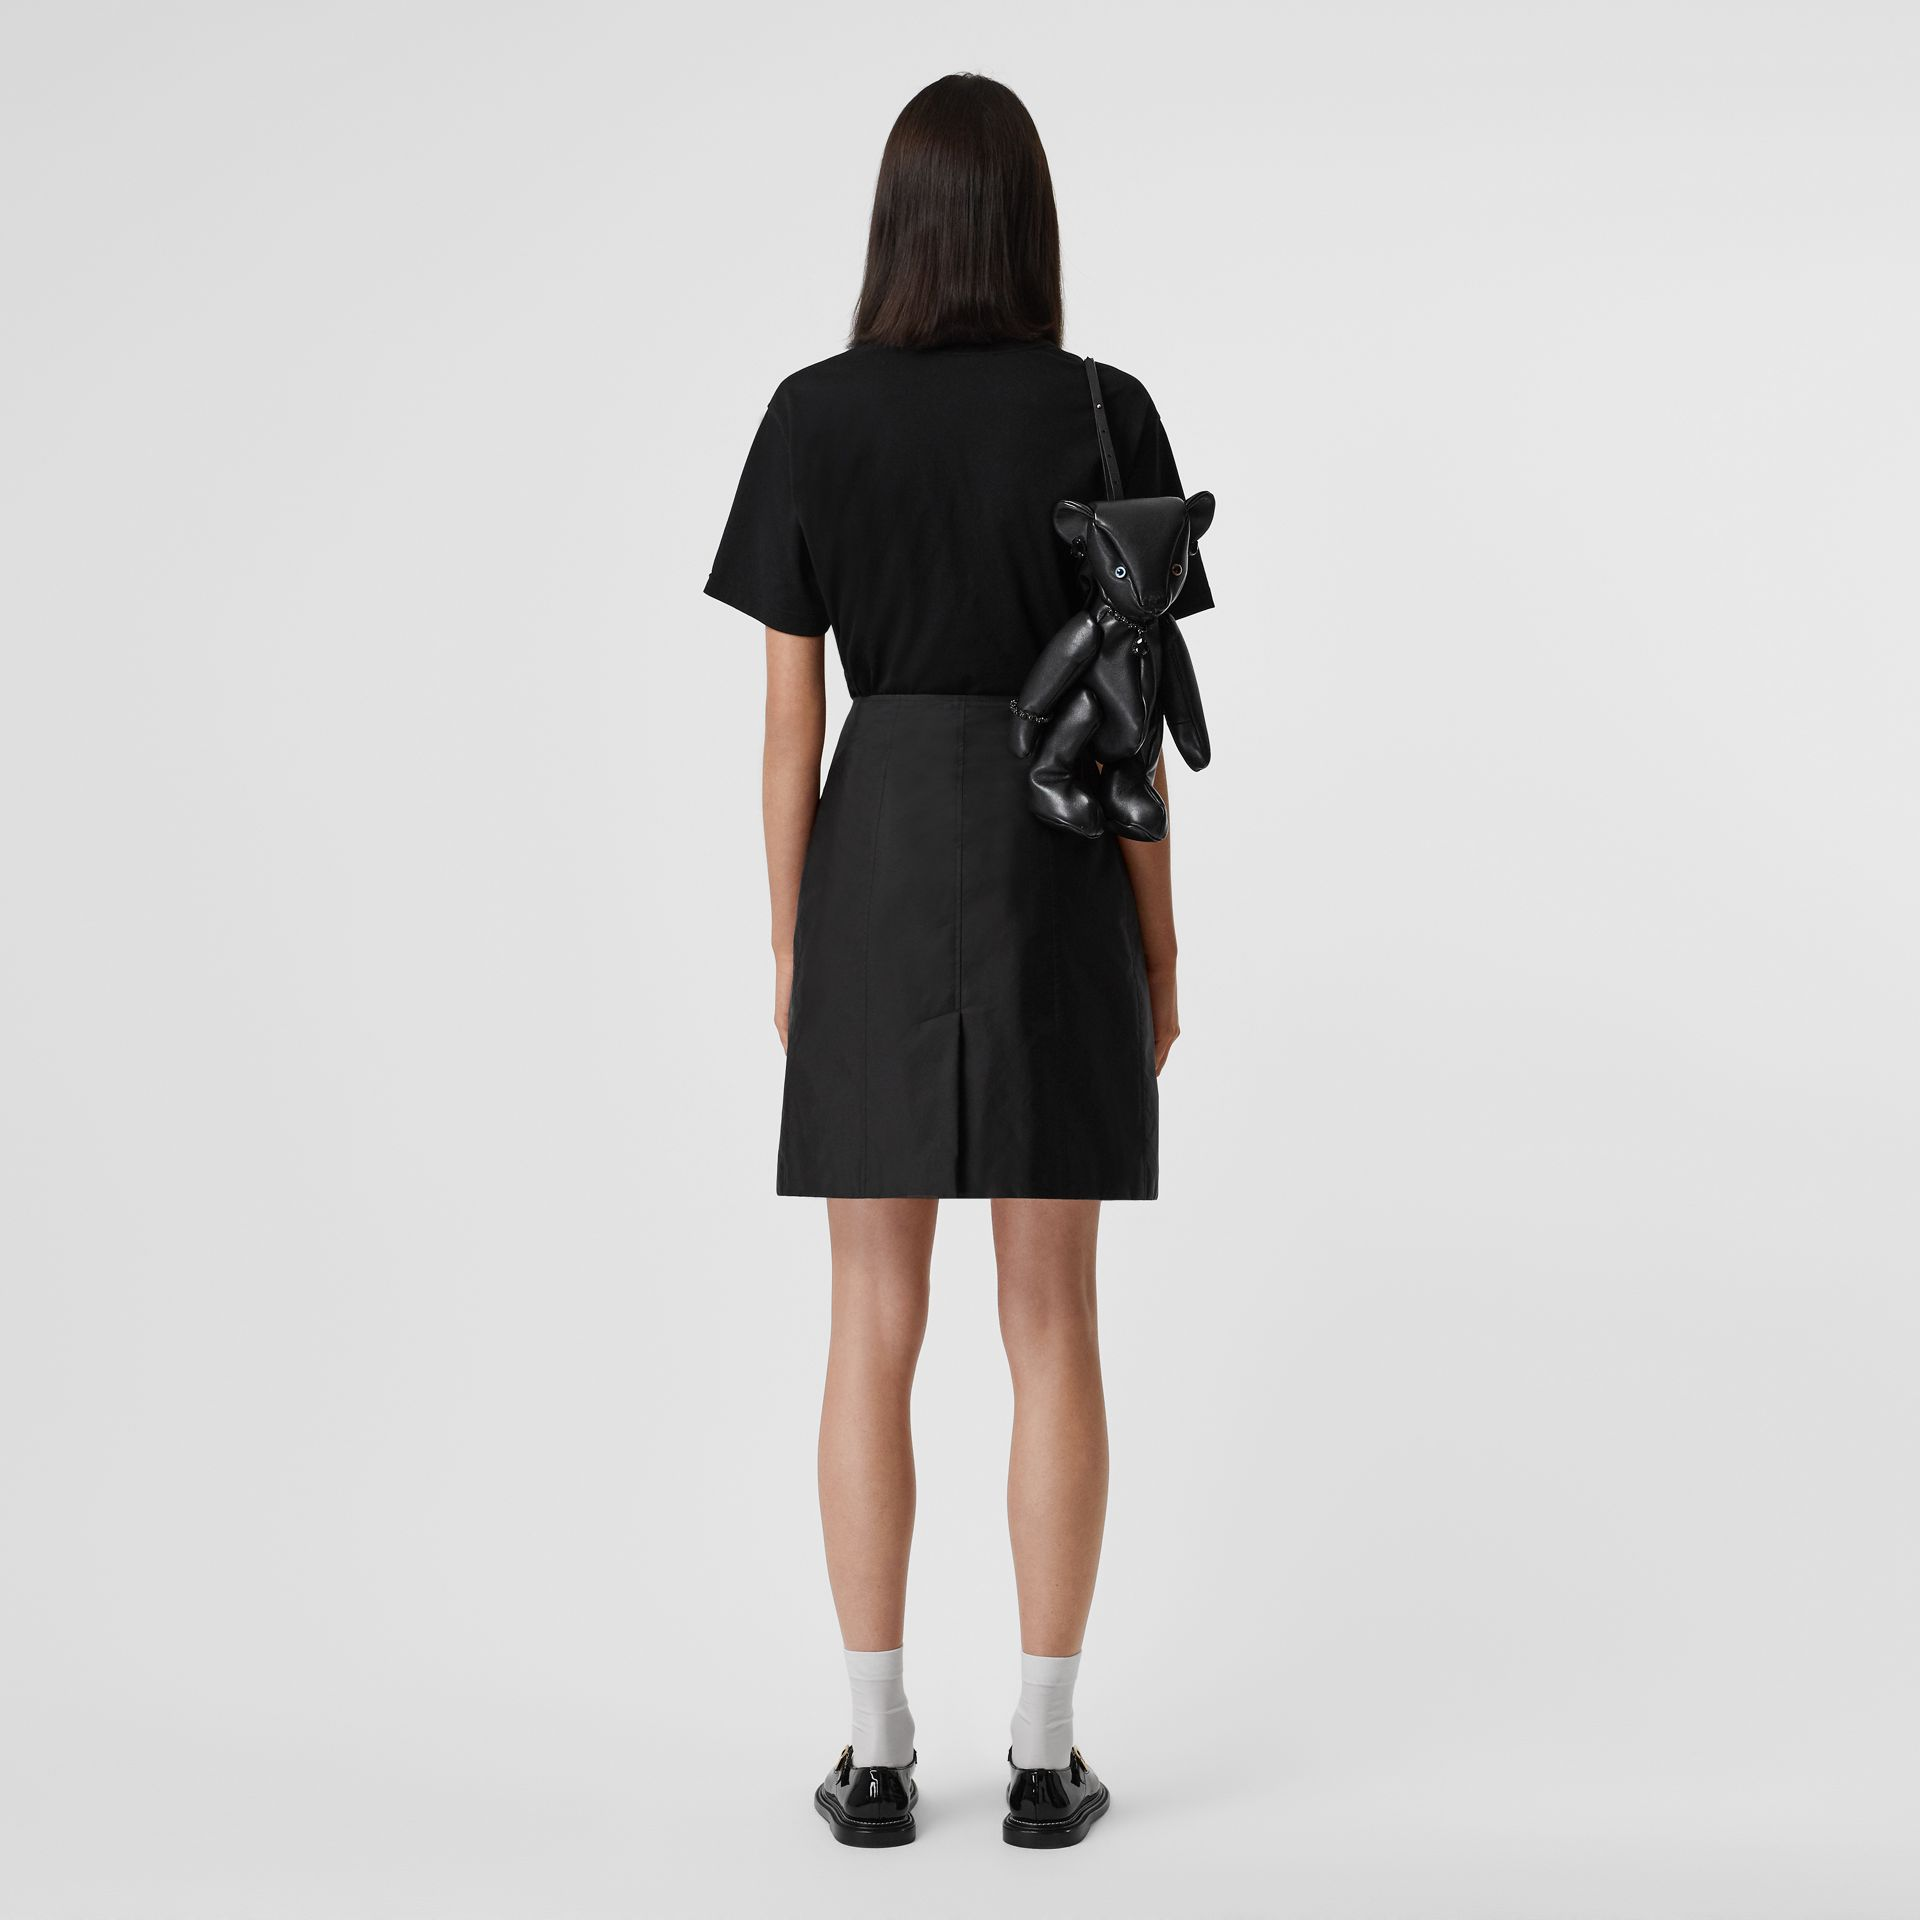 Nylon Trench Skirt in Black - Women | Burberry - gallery image 3